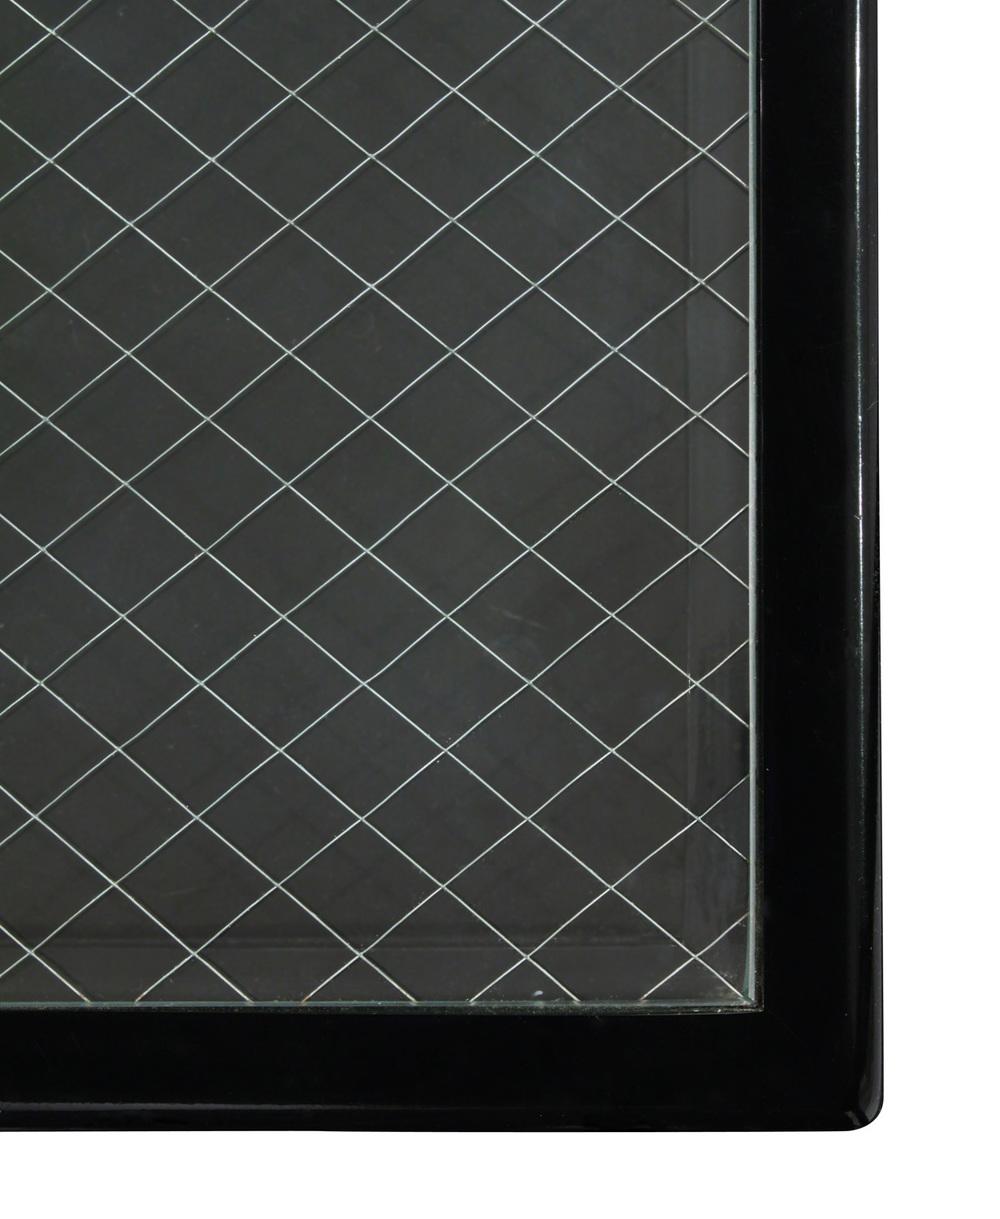 Montoya 150 blk lqr+wire glass top diningtable156 detail3 hires.jpg